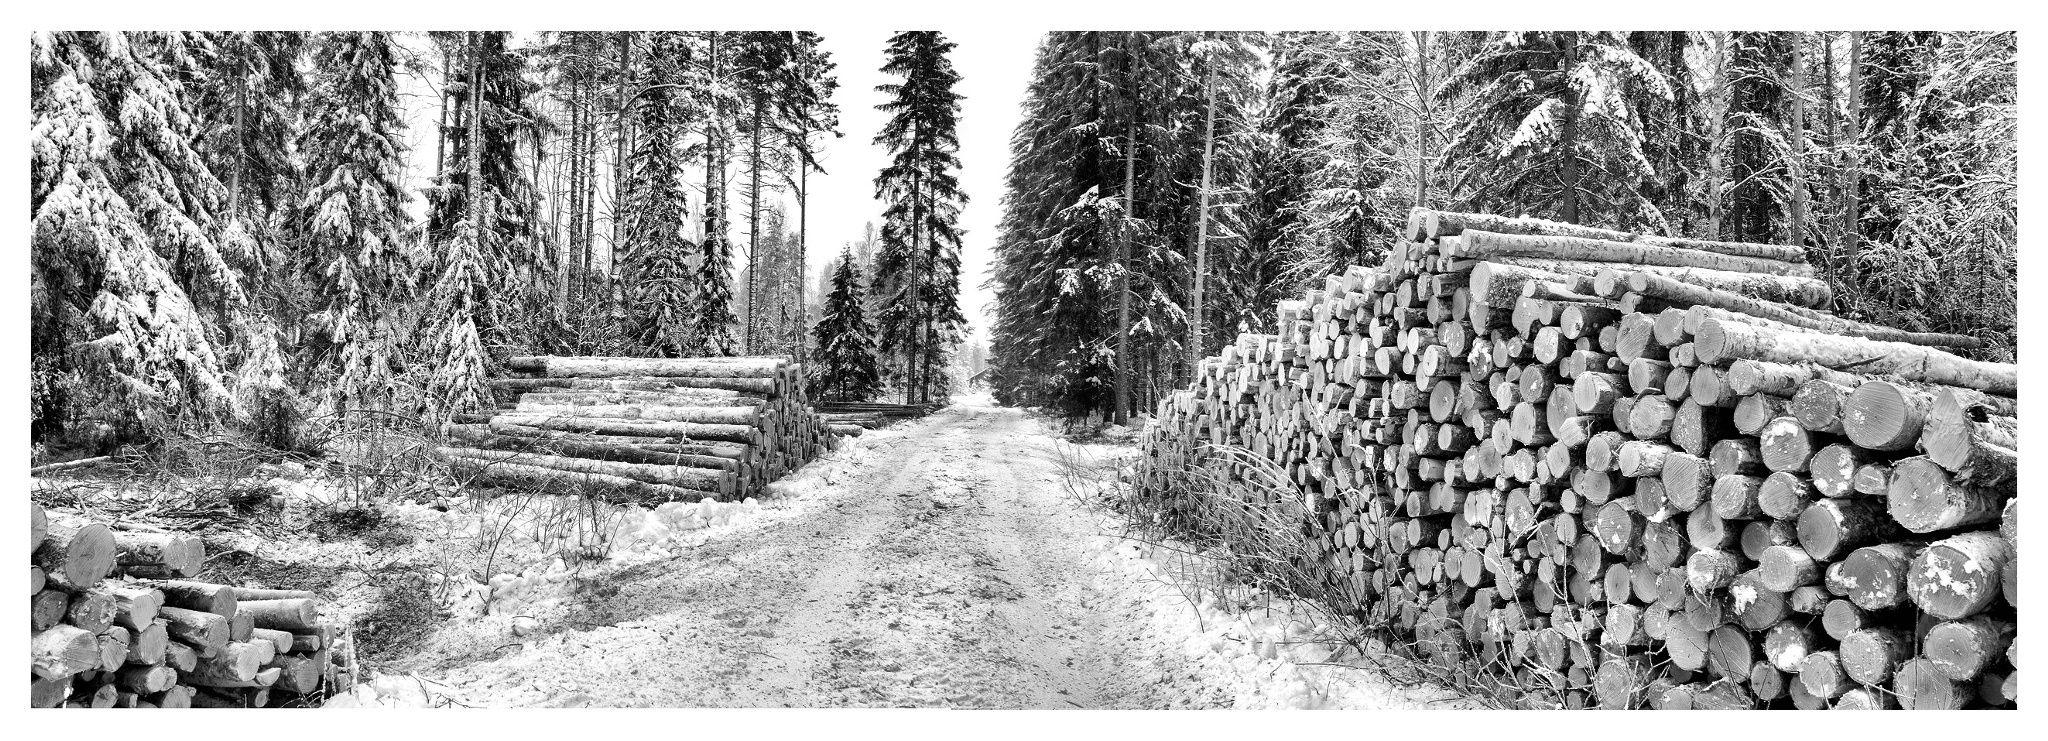 Wood Cutters Day by Pekka Ilari T. on 500px